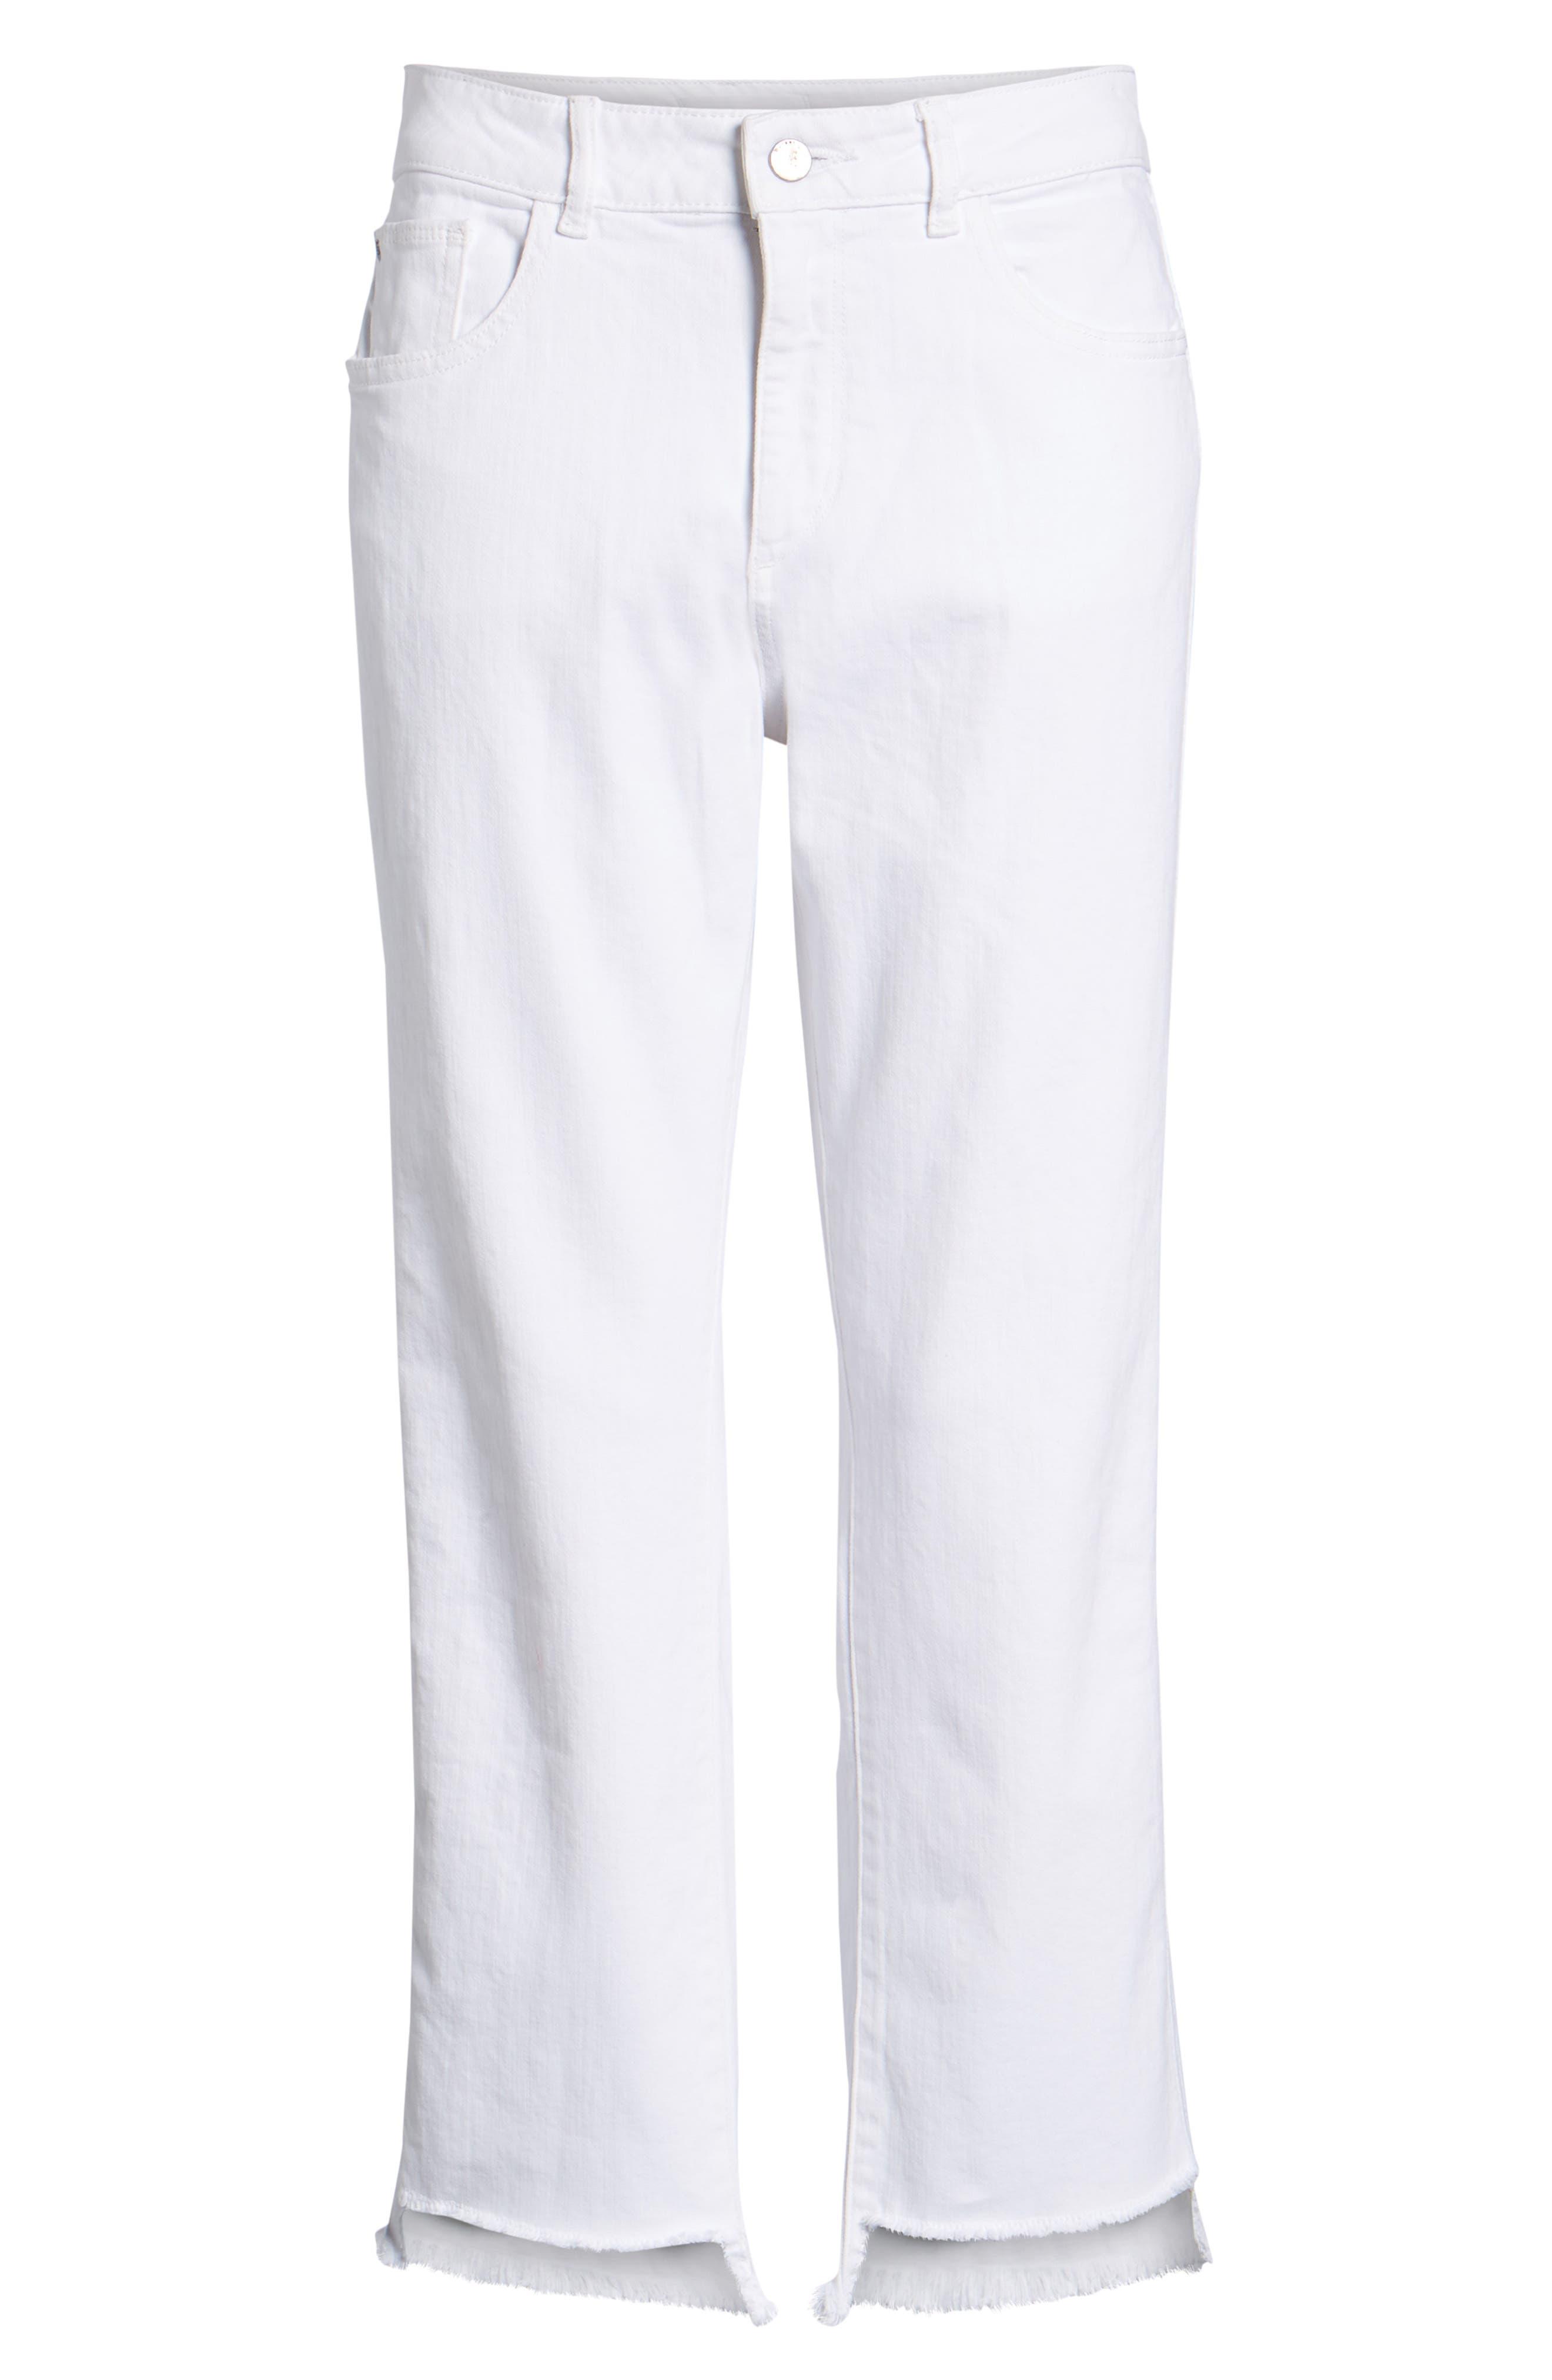 Patti High Waist Crop Straight Leg Jeans,                             Alternate thumbnail 7, color,